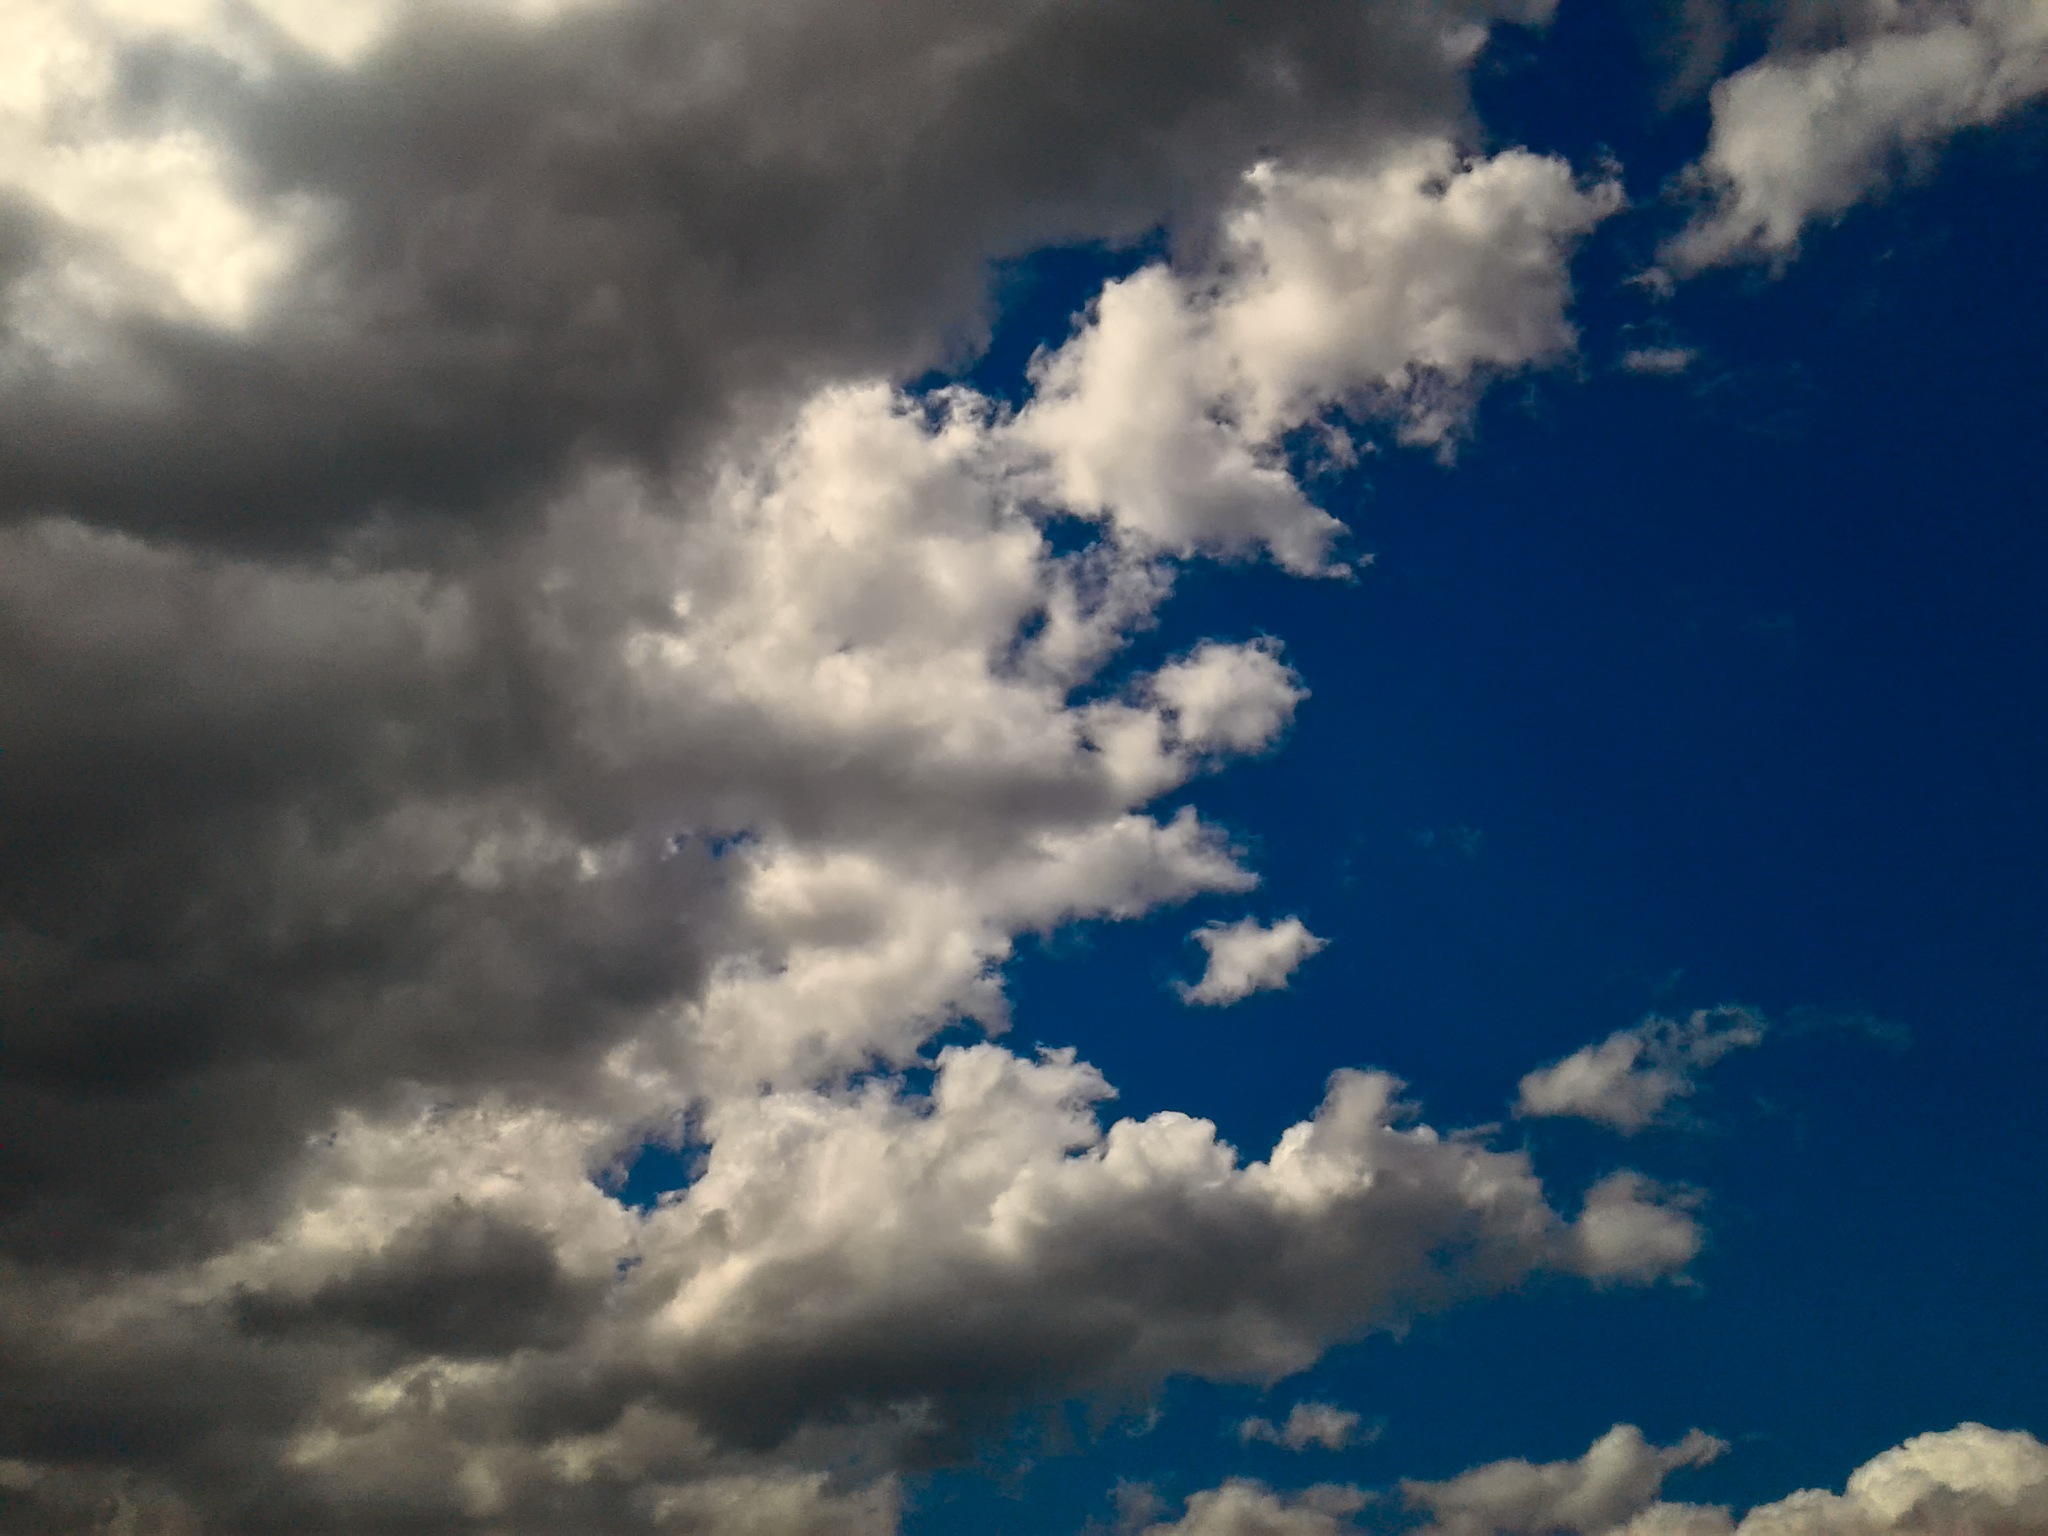 Different skies by Евгений Козлов